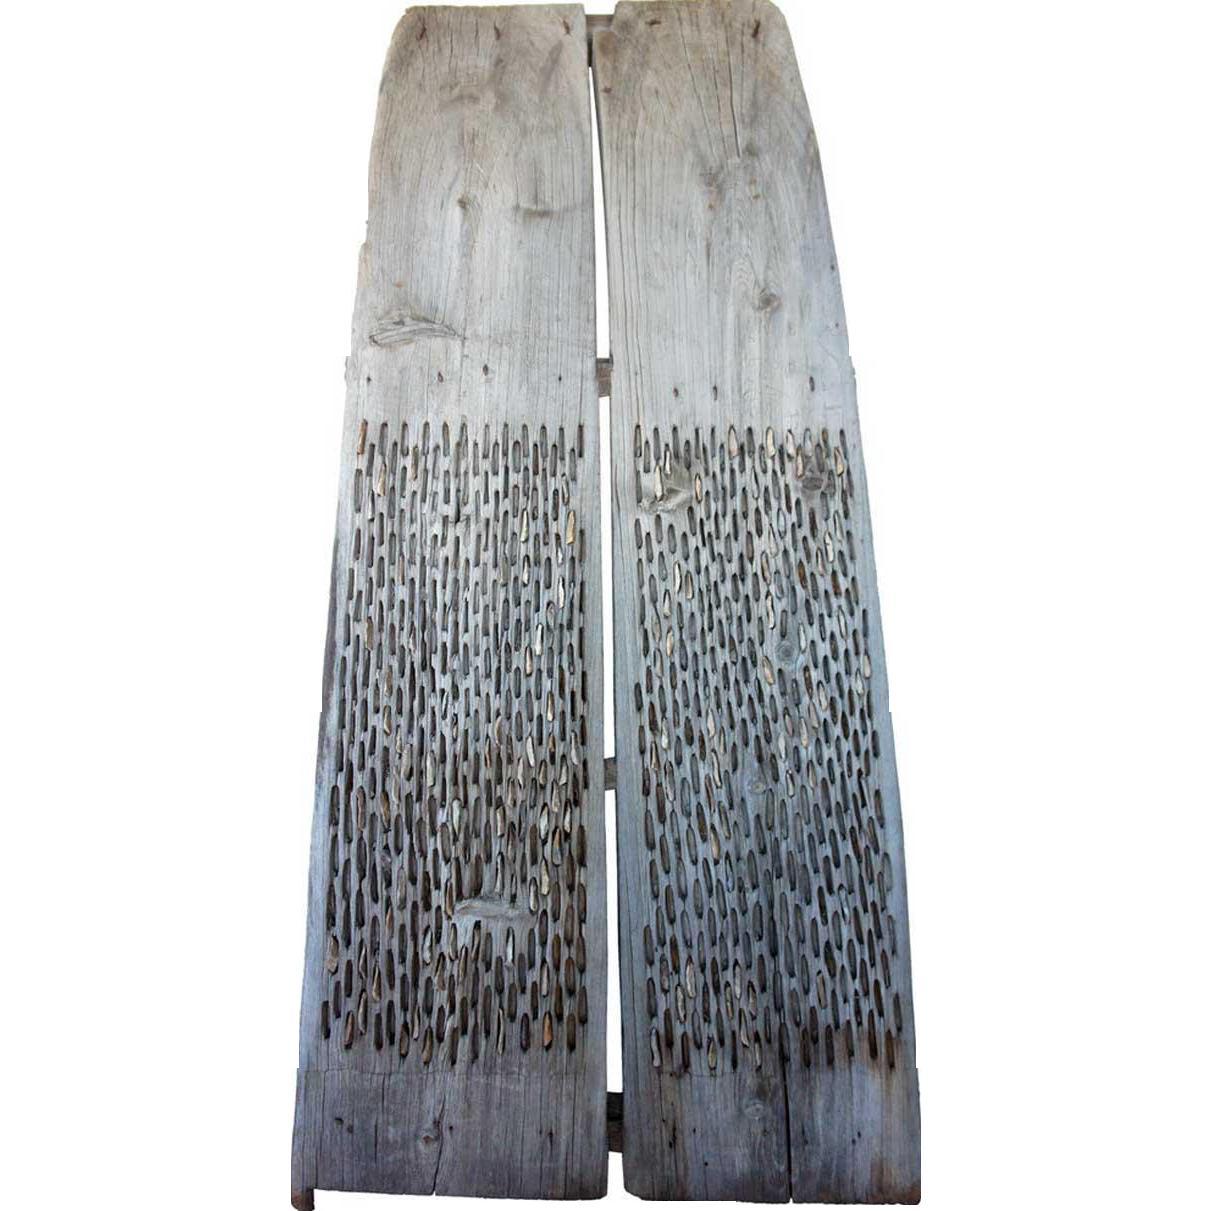 Spanish Primitive Pine and Stone Threshing Harrow/Agricultural Raking Tool